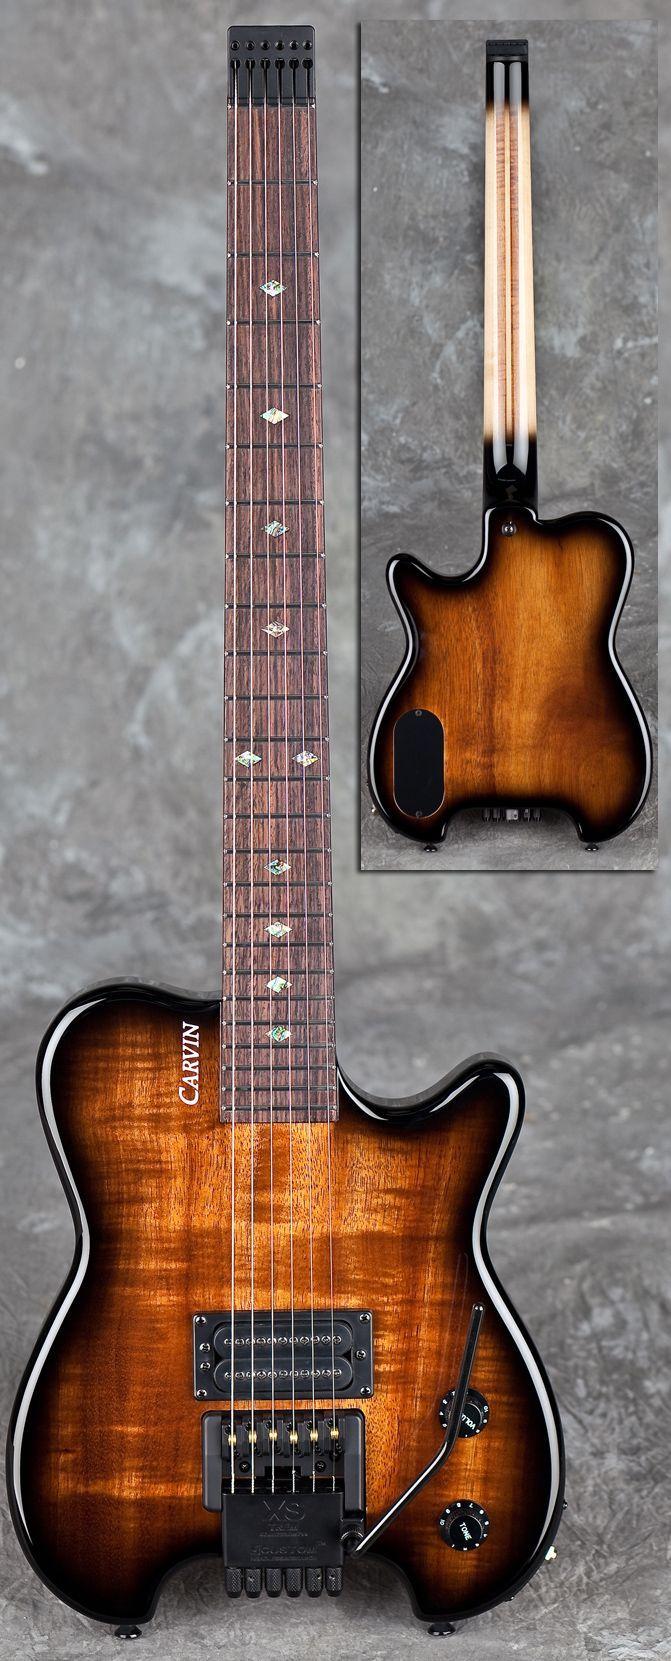 HH1X Allan Holdsworth Signature Headless Guitar w/ XSTrem